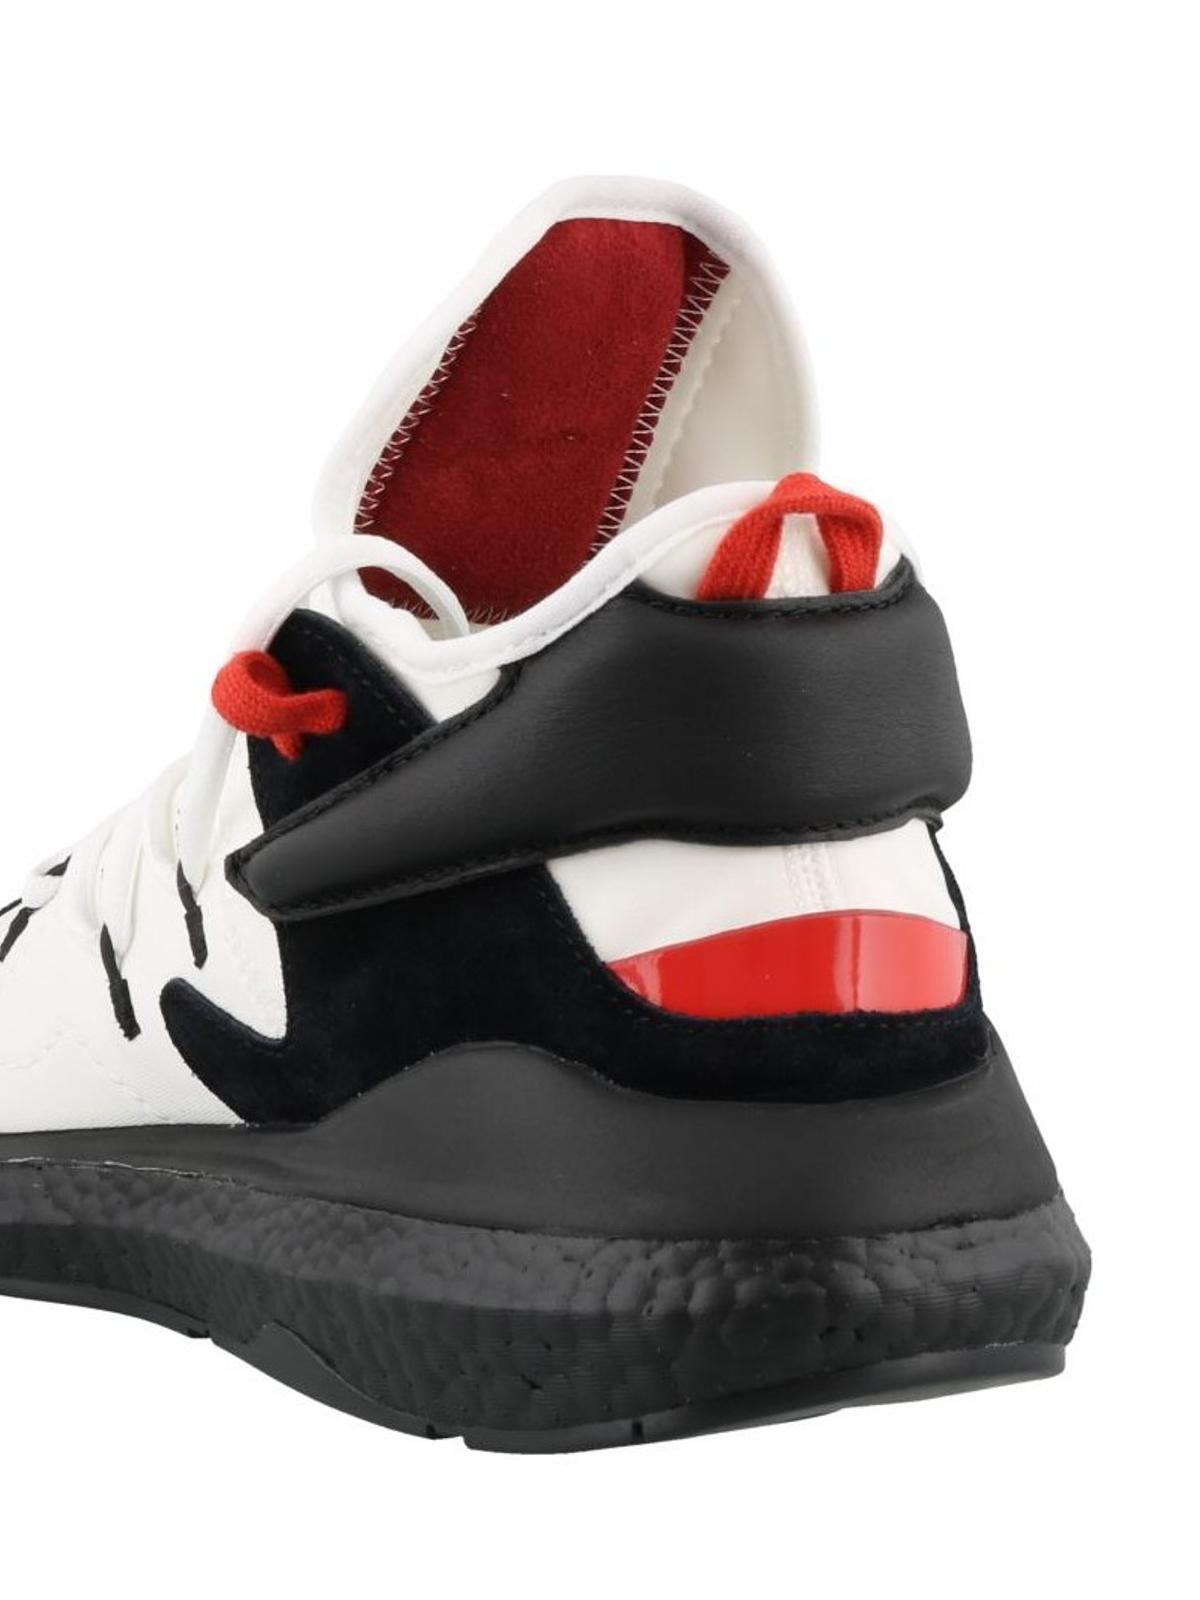 98c9850fb841f Adidas Y-3 - Kusari II sneakers - trainers - BC0964